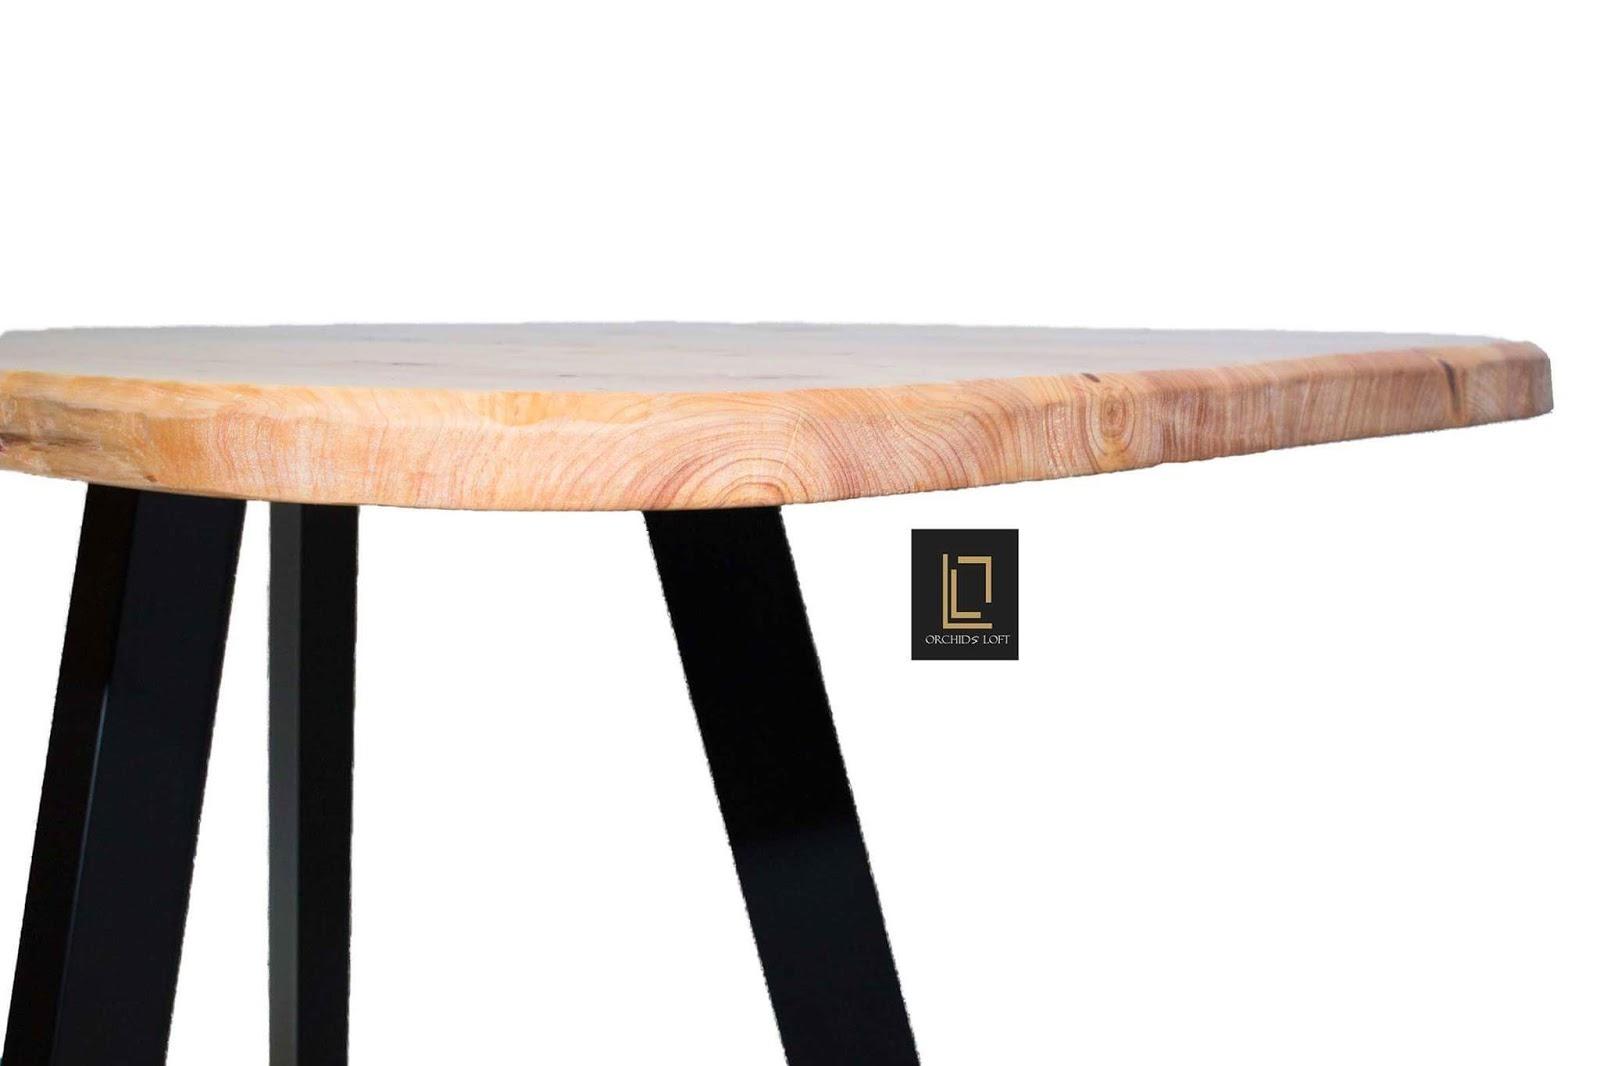 orchids loft roots table wood table holztische. Black Bedroom Furniture Sets. Home Design Ideas